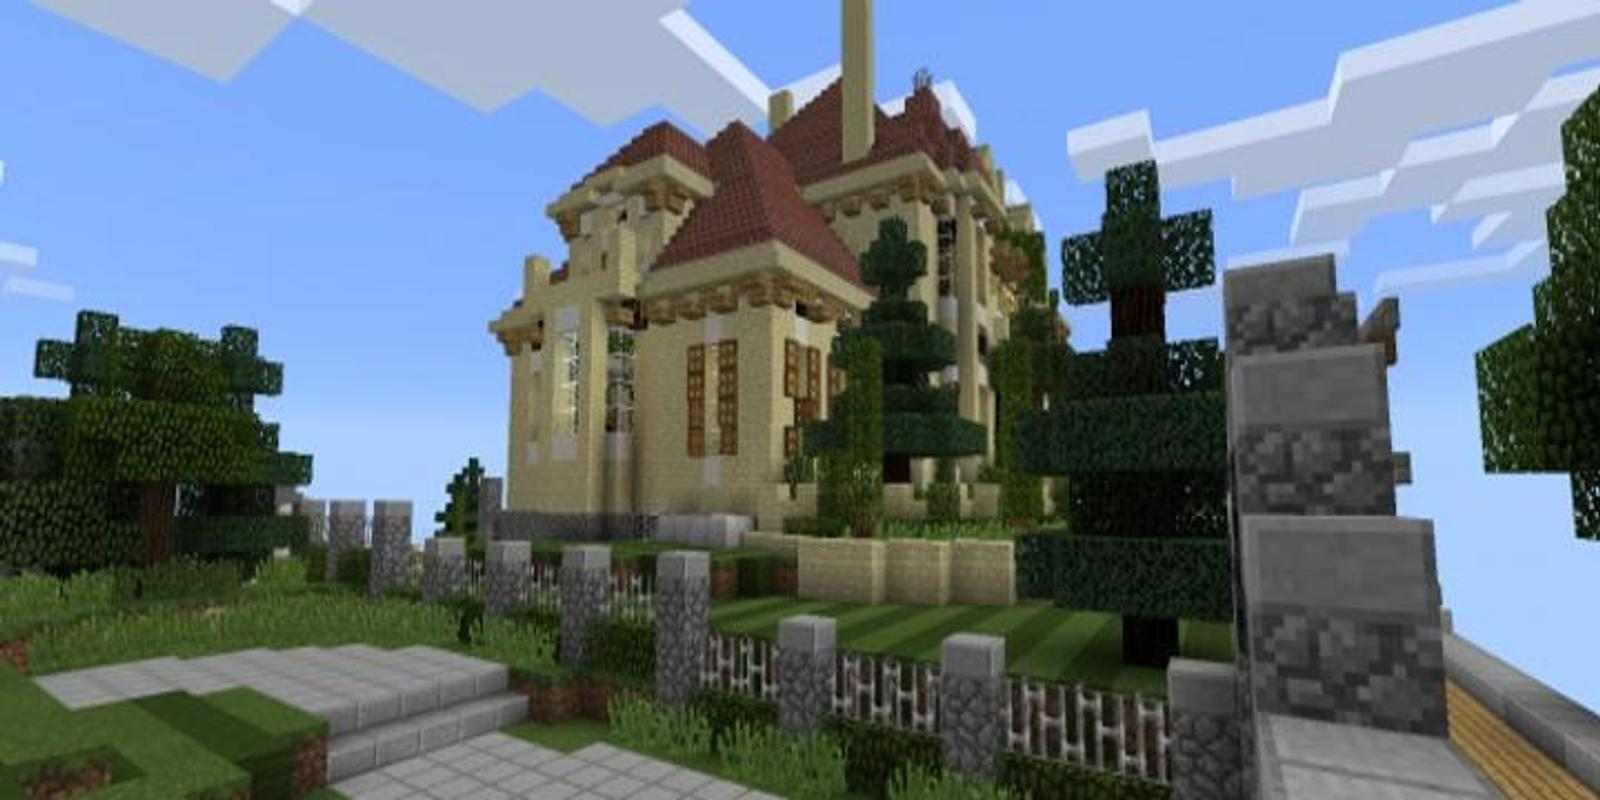 Скачать The Future Home для Minecraft - ru-m.org